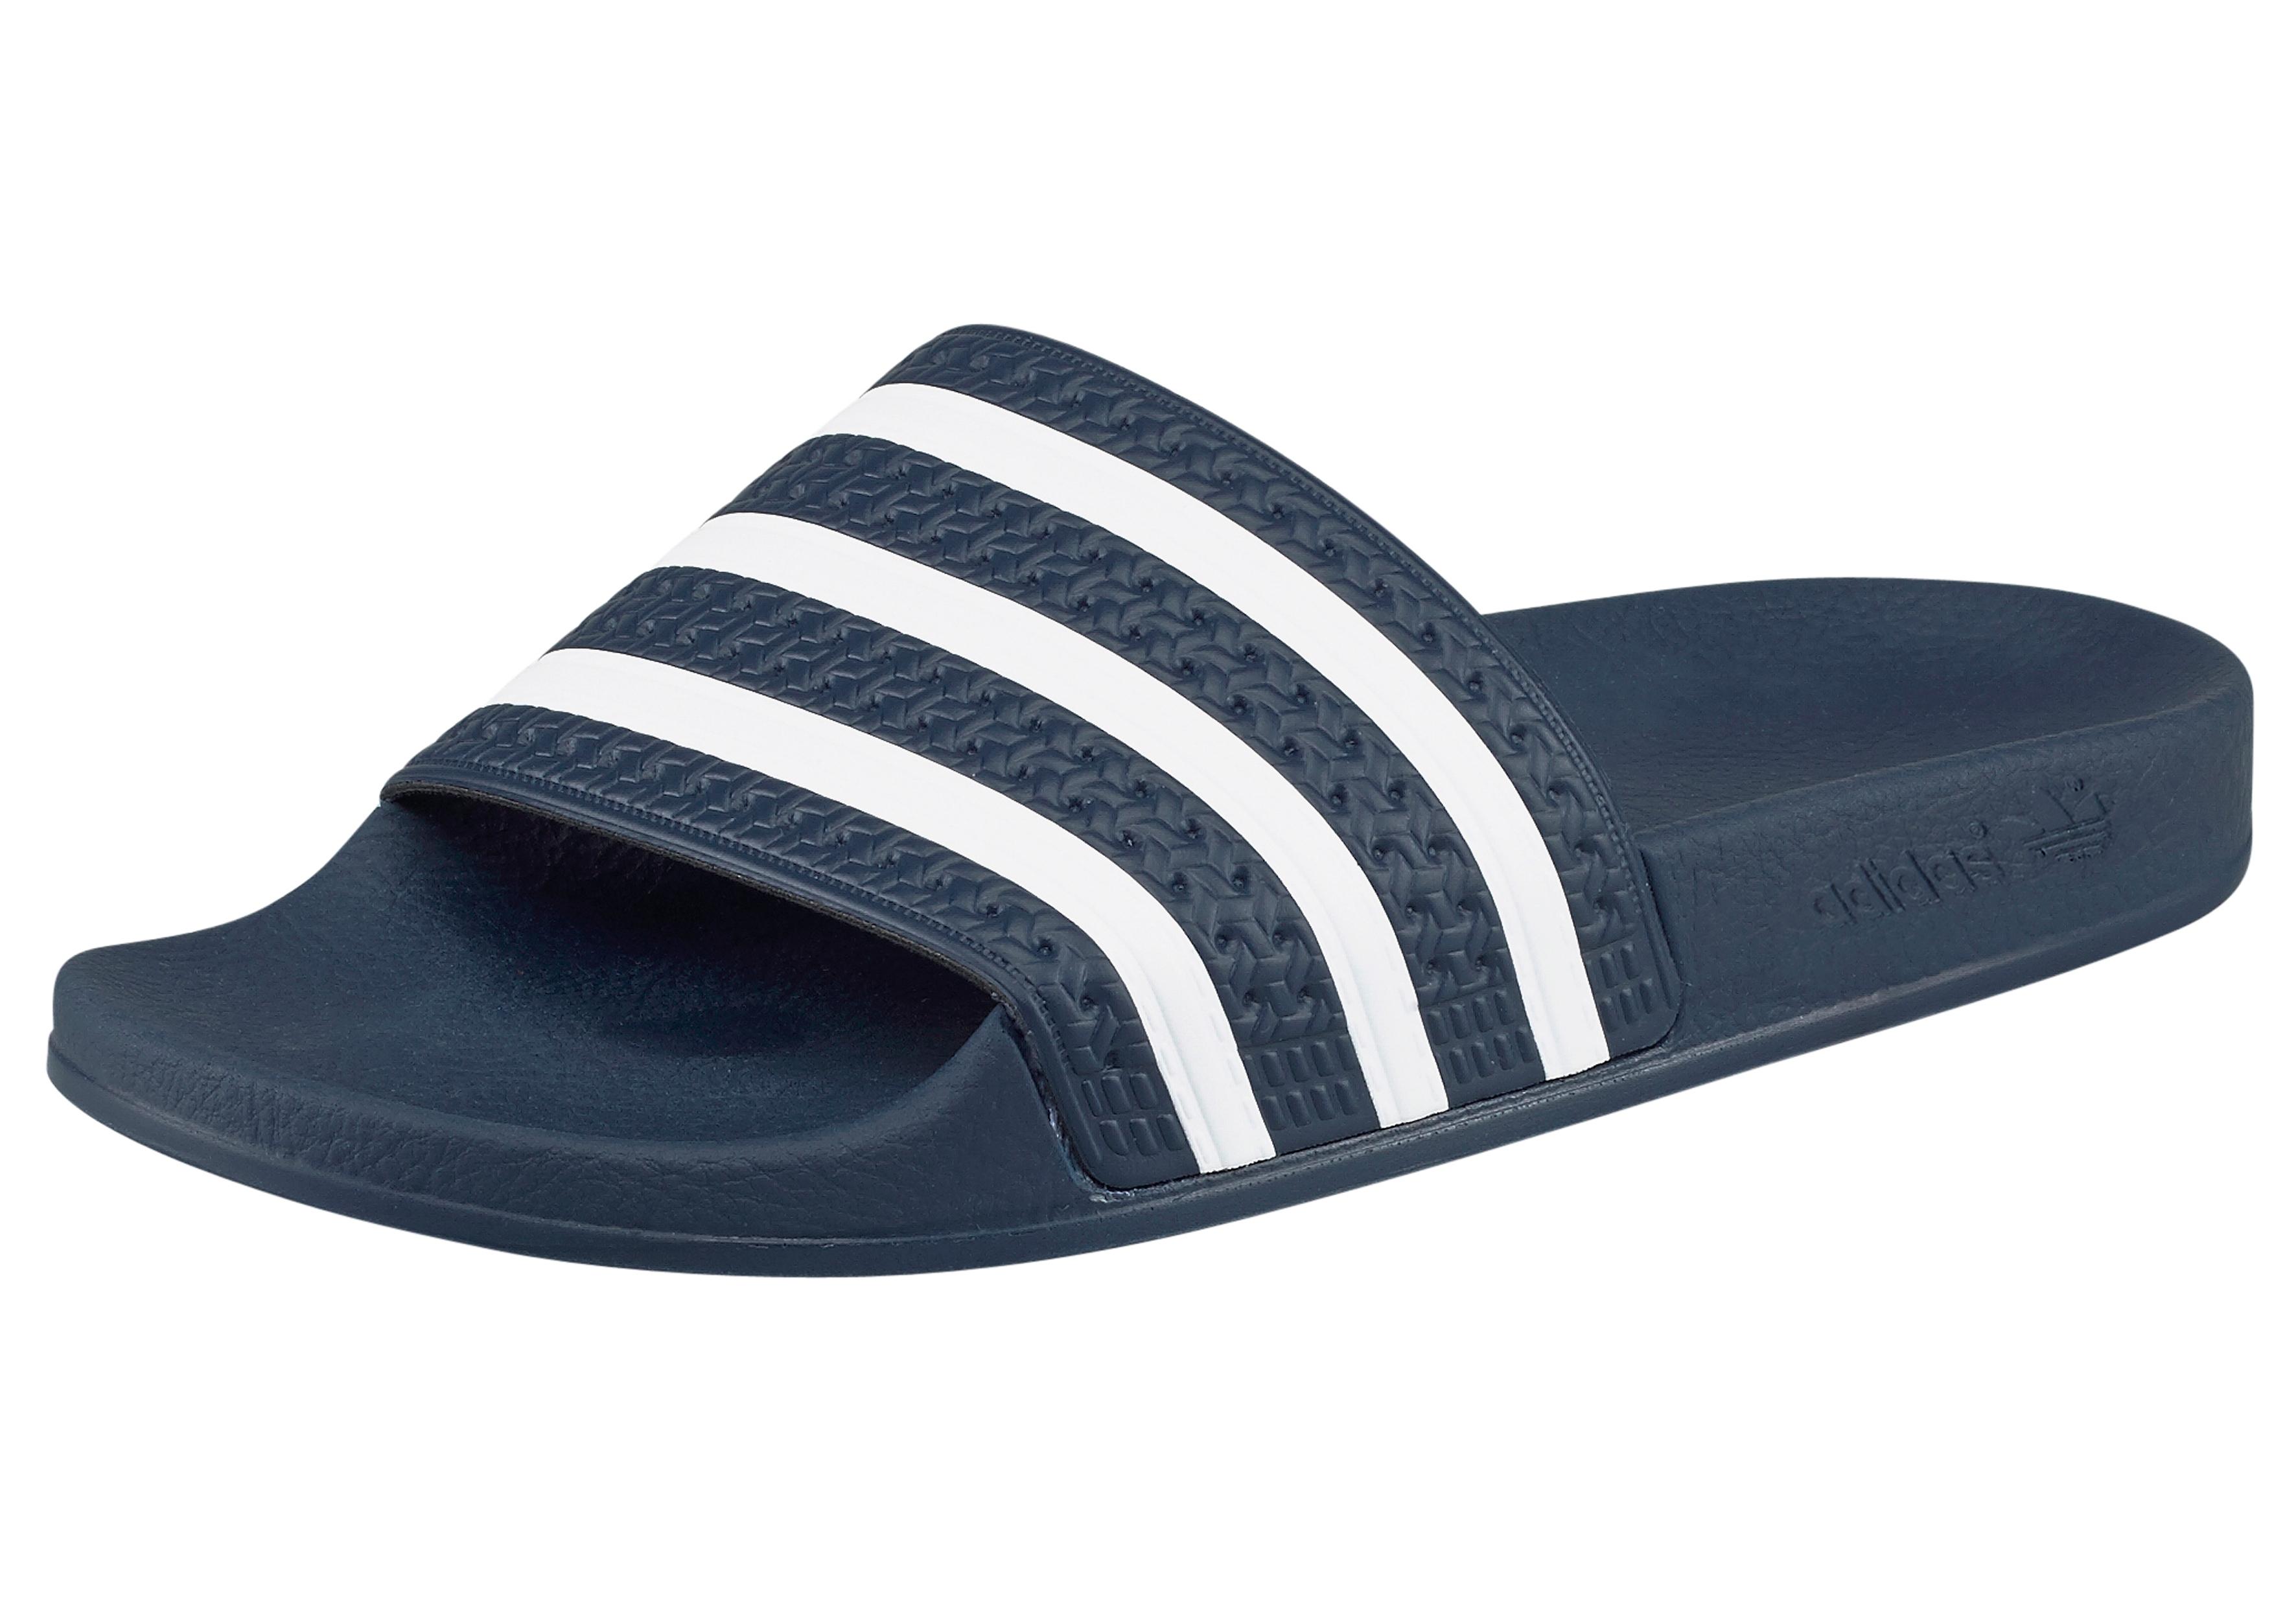 e5659728384 adidas Originals Badslippers Adilette? Bestel nu bij | OTTO